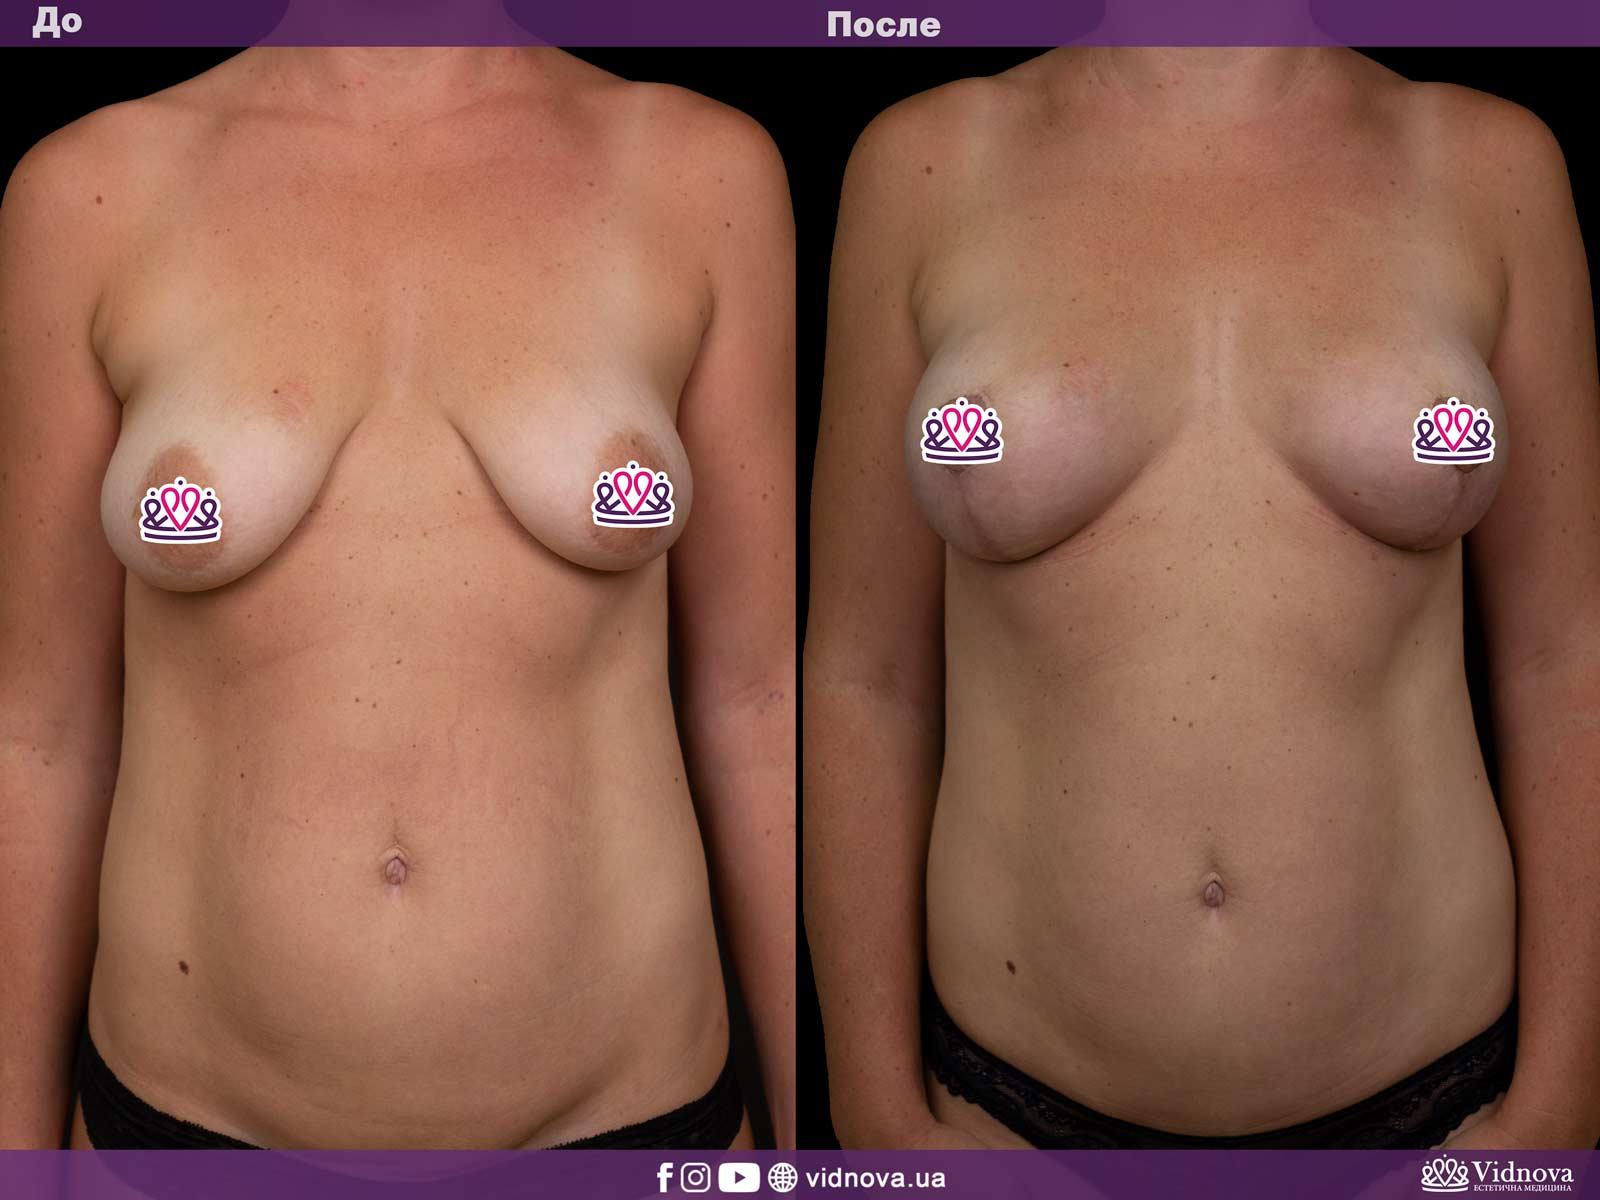 Подтяжка груди: Фото ДО и ПОСЛЕ - Пример №12-1 - Клиника Vidnova